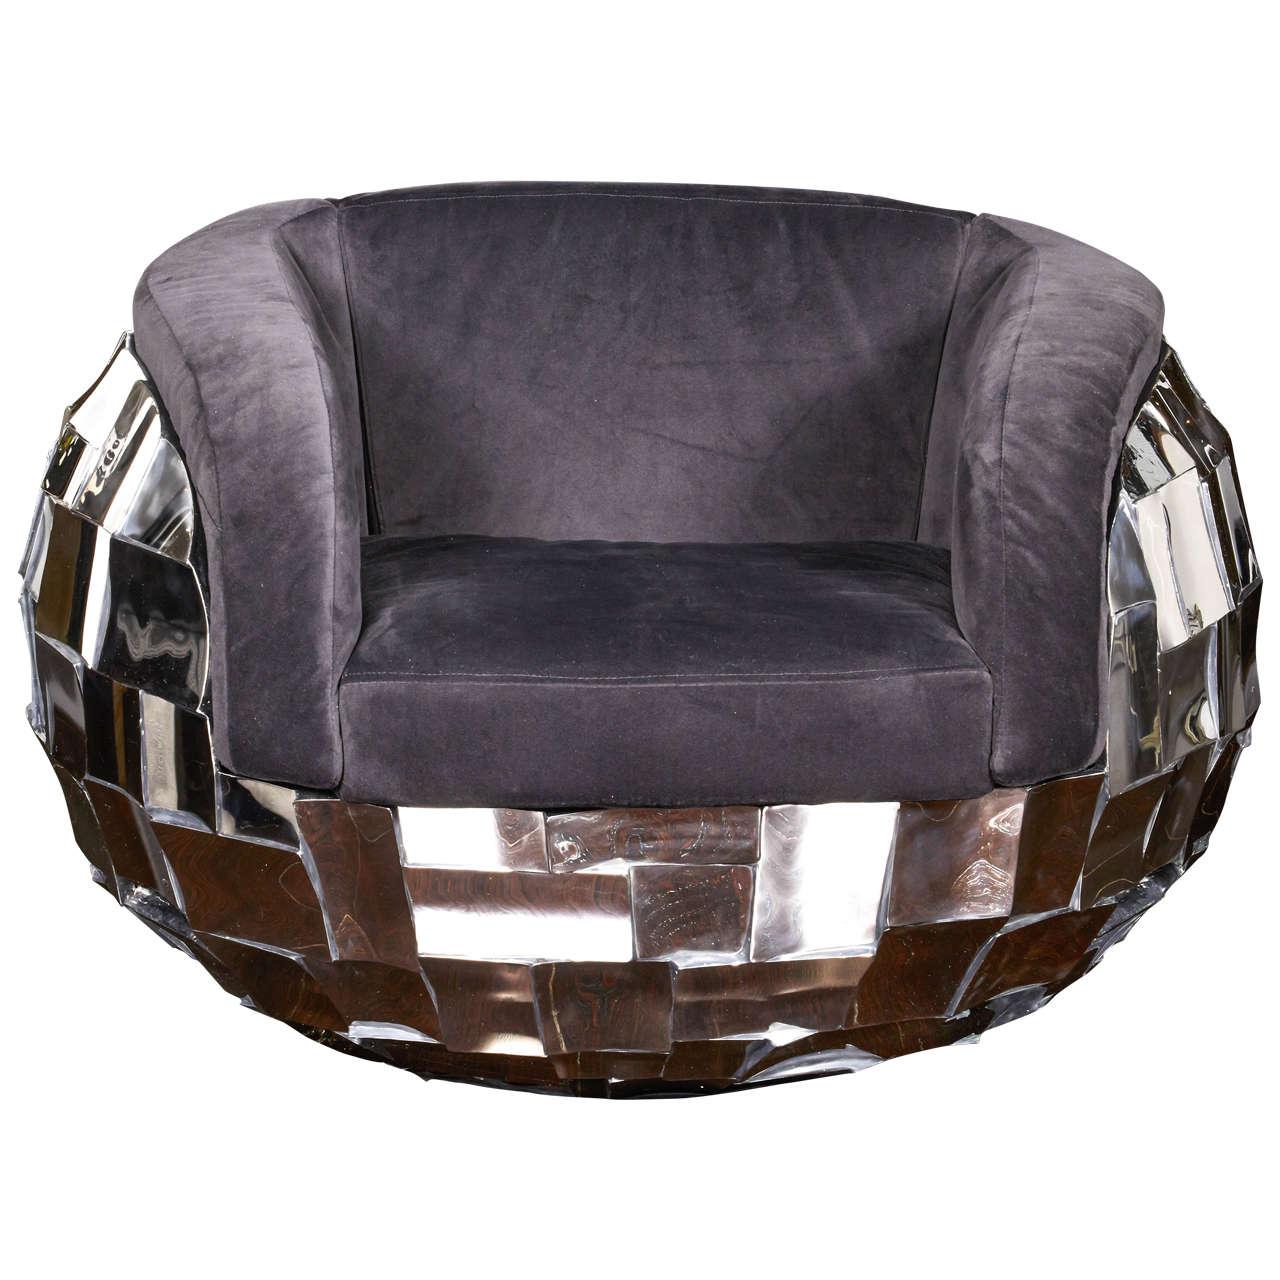 Unique Chair: Unique Patchwork Metal Chair For Sale At 1stdibs